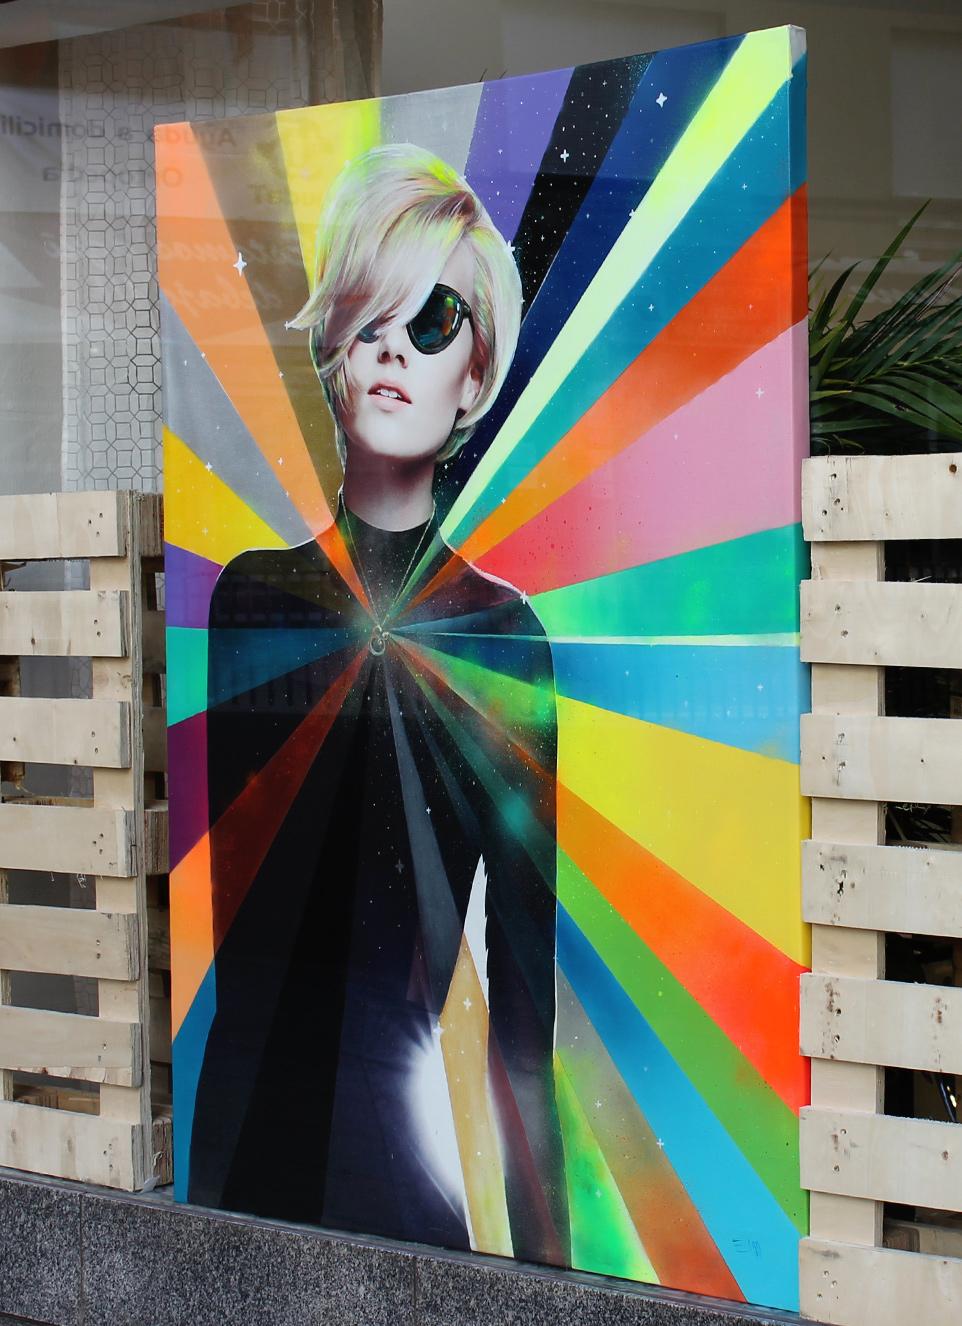 Neon lady for the hairdresser salon Corto & Cambio